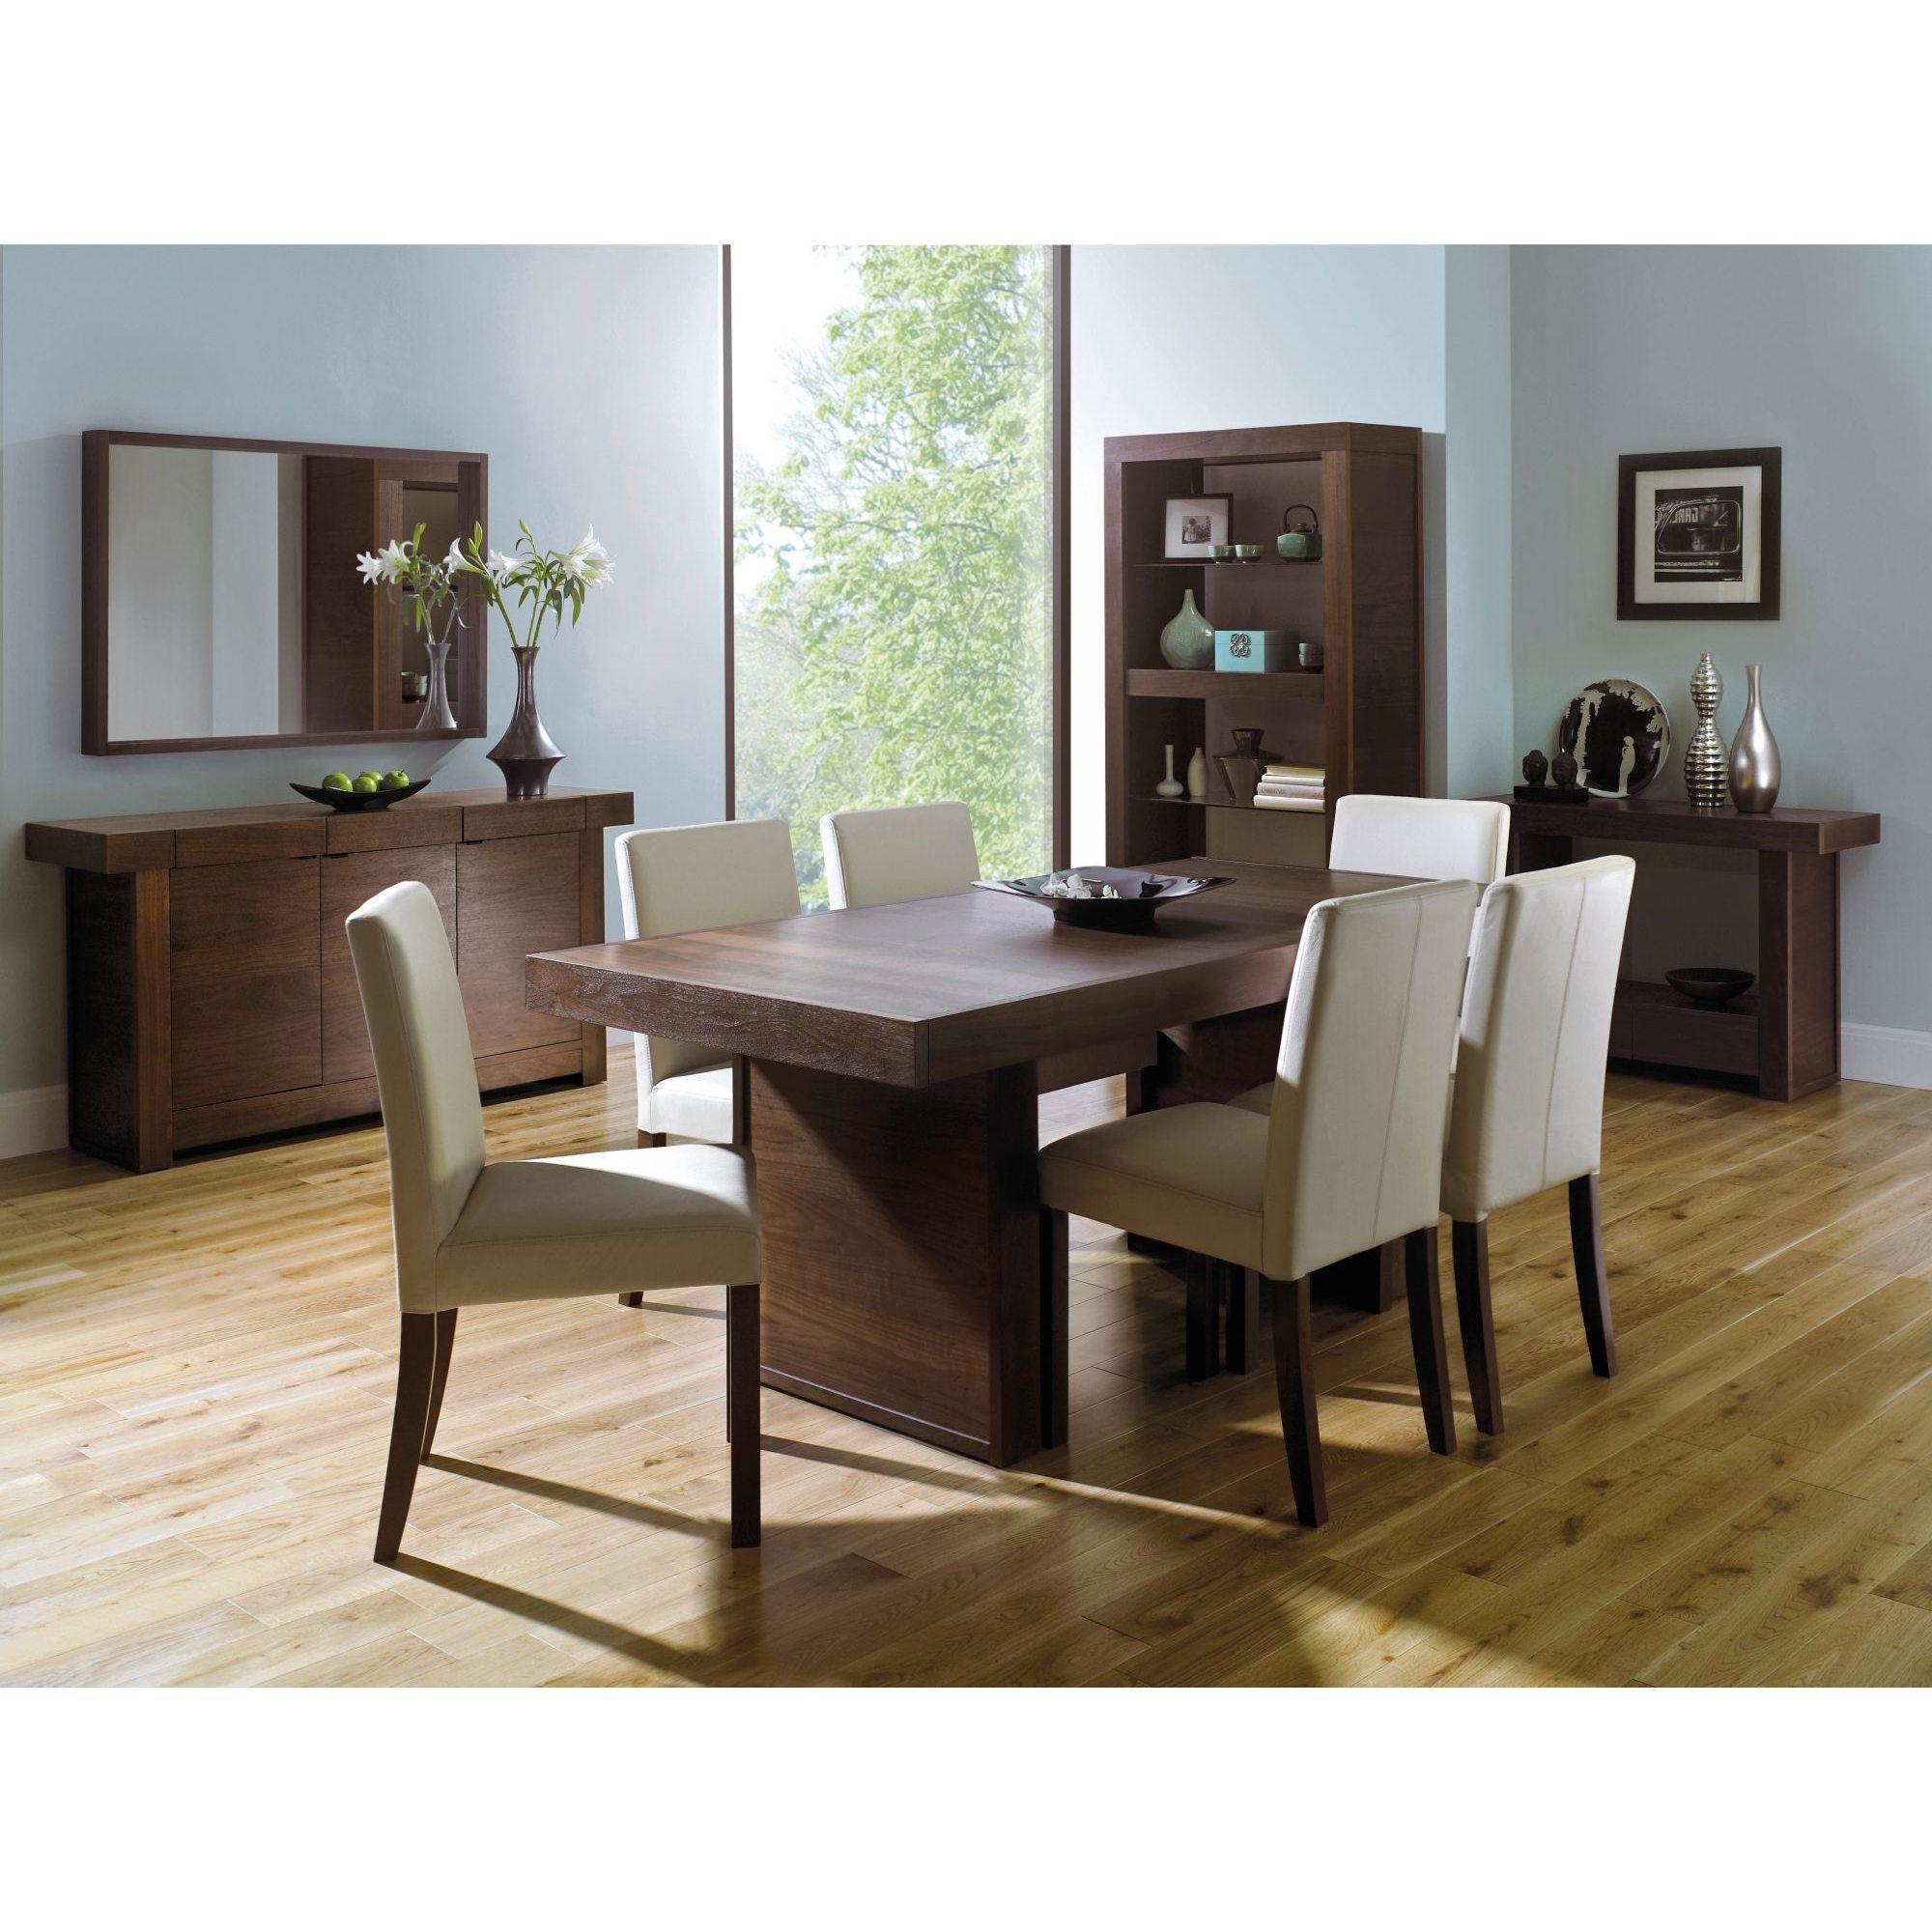 Akita Walnut 6 Seater Panel Dining Table